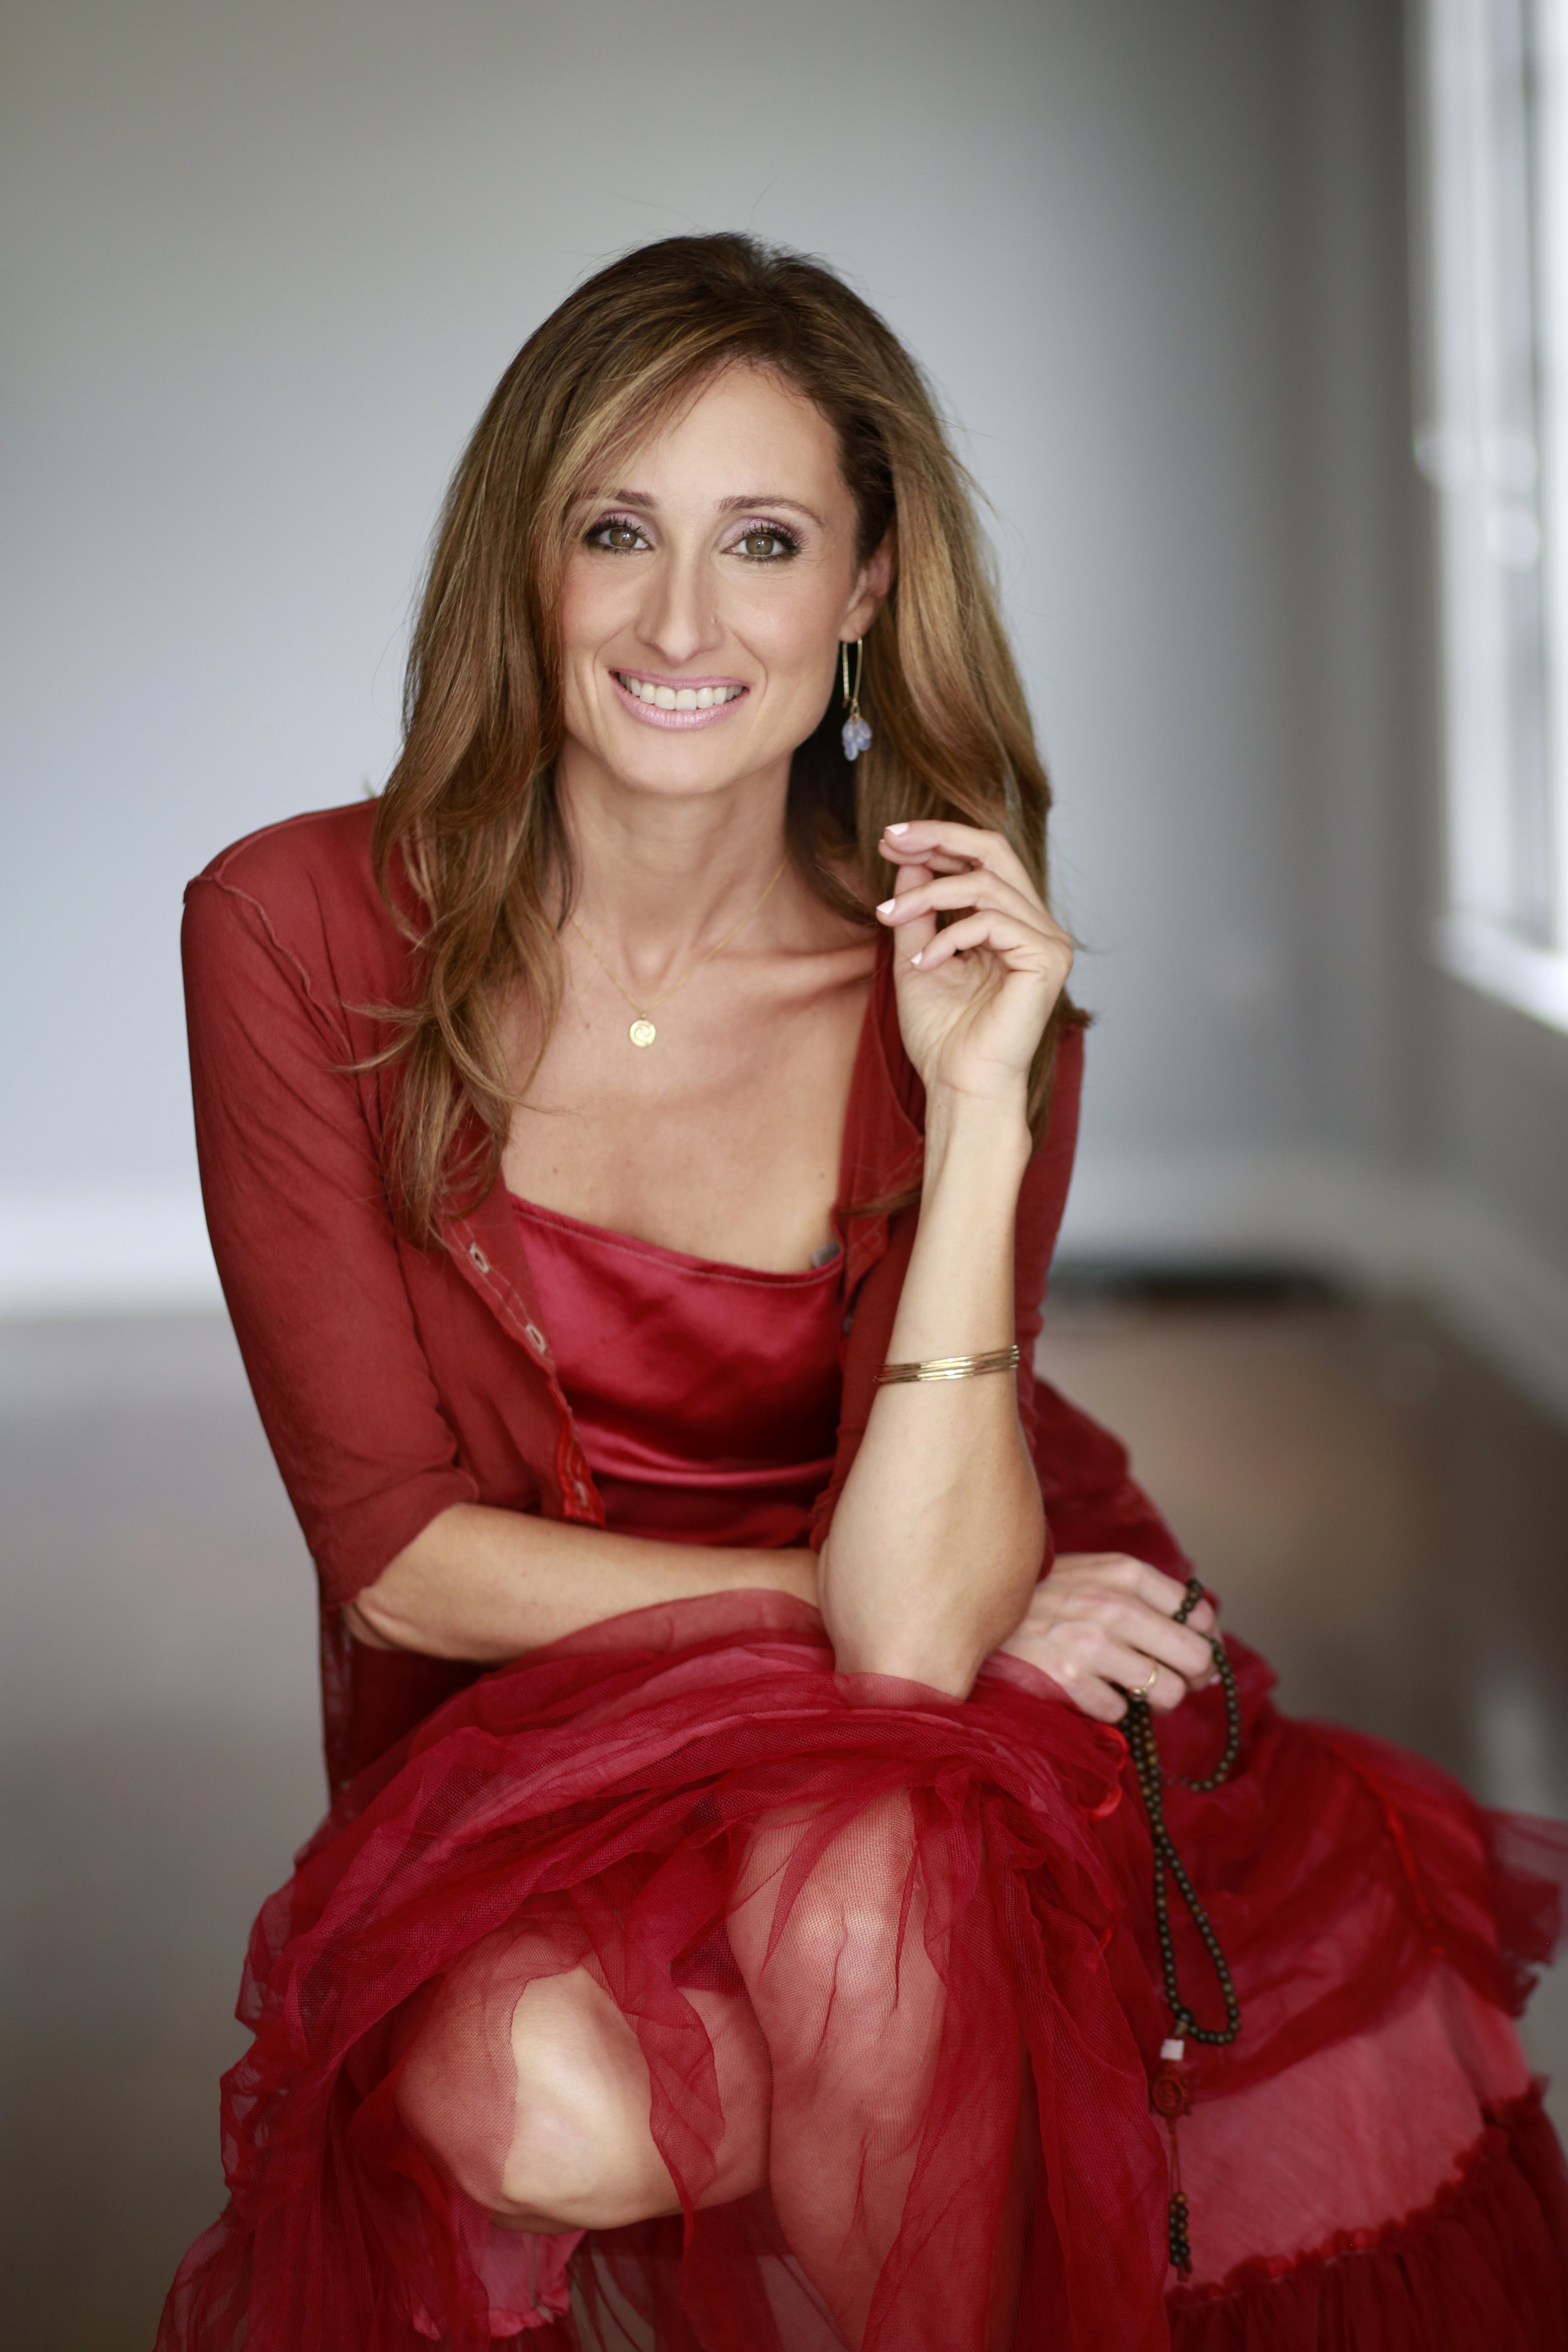 Elena Bensonoff - PERSONAL BRANDING & WEB DESIGN CLIENT